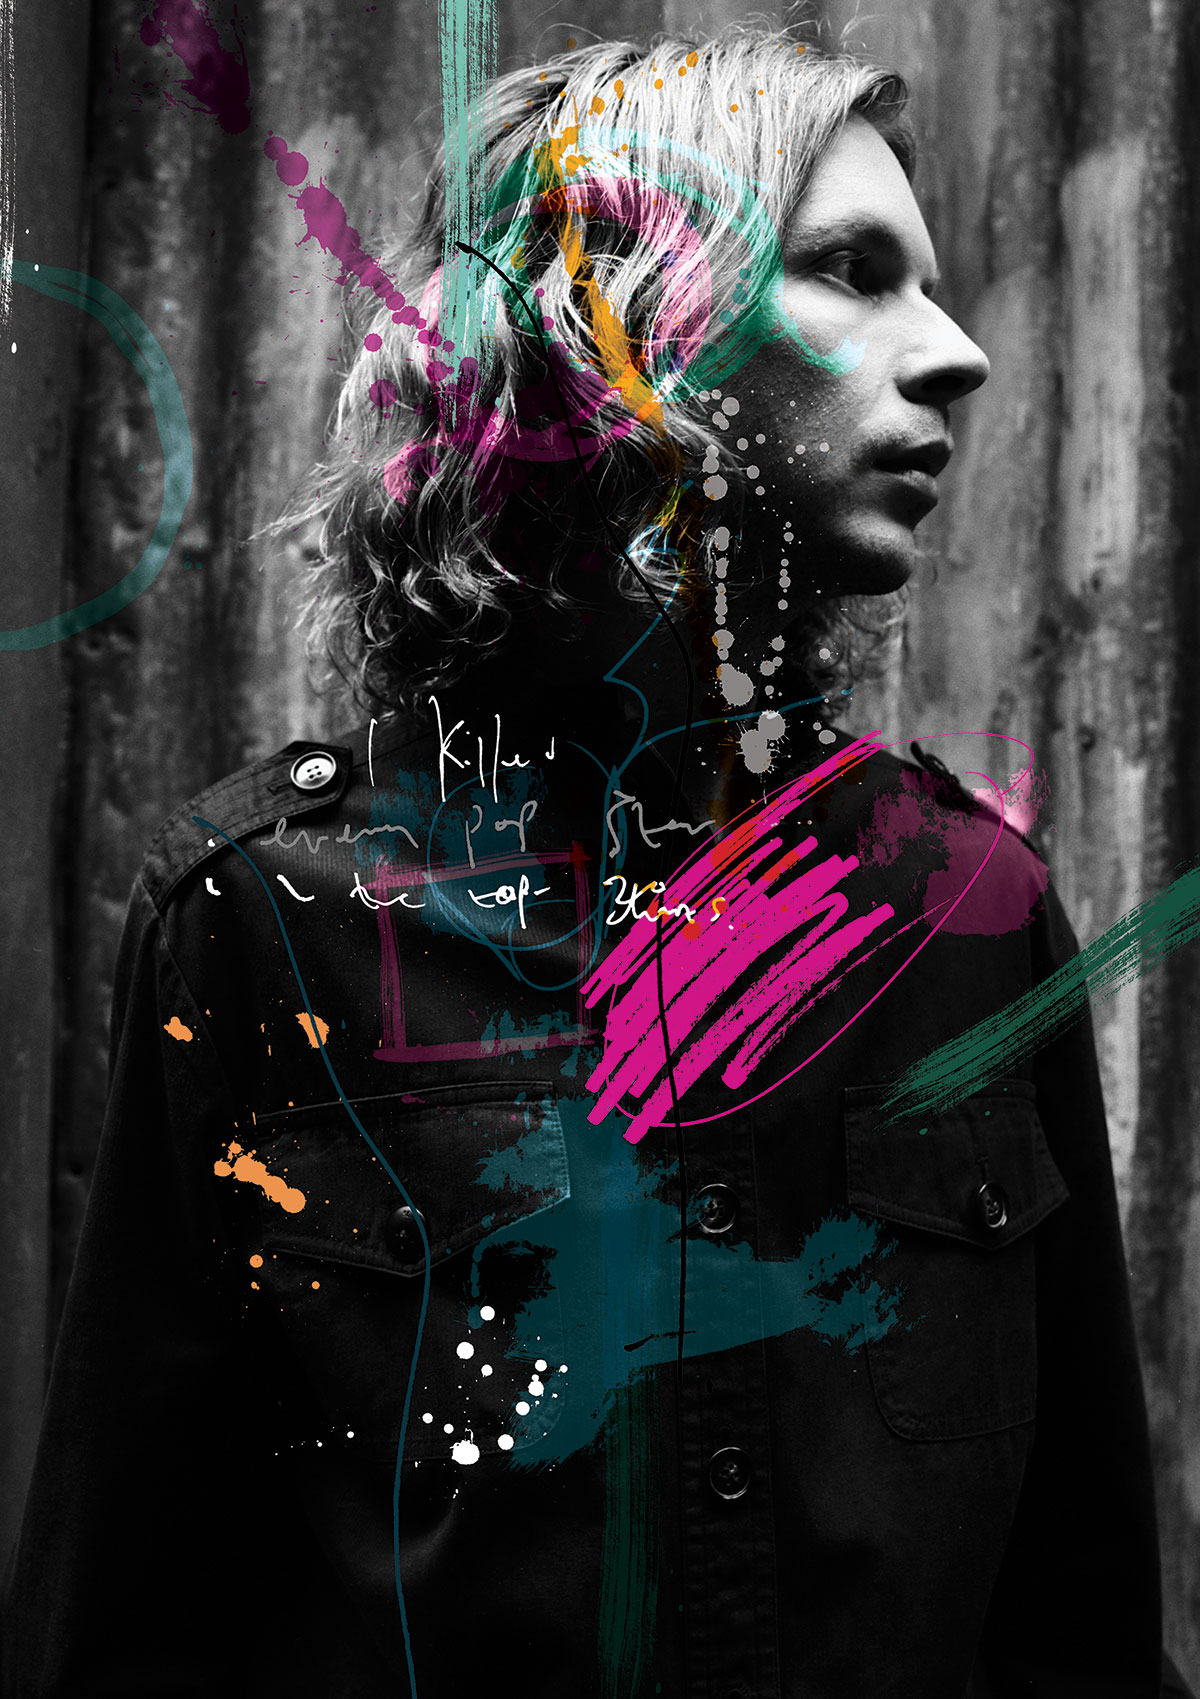 Lend Me Your Ear artwork, illustration, music photography, Andrew Cotterill Ben Tallon Beck